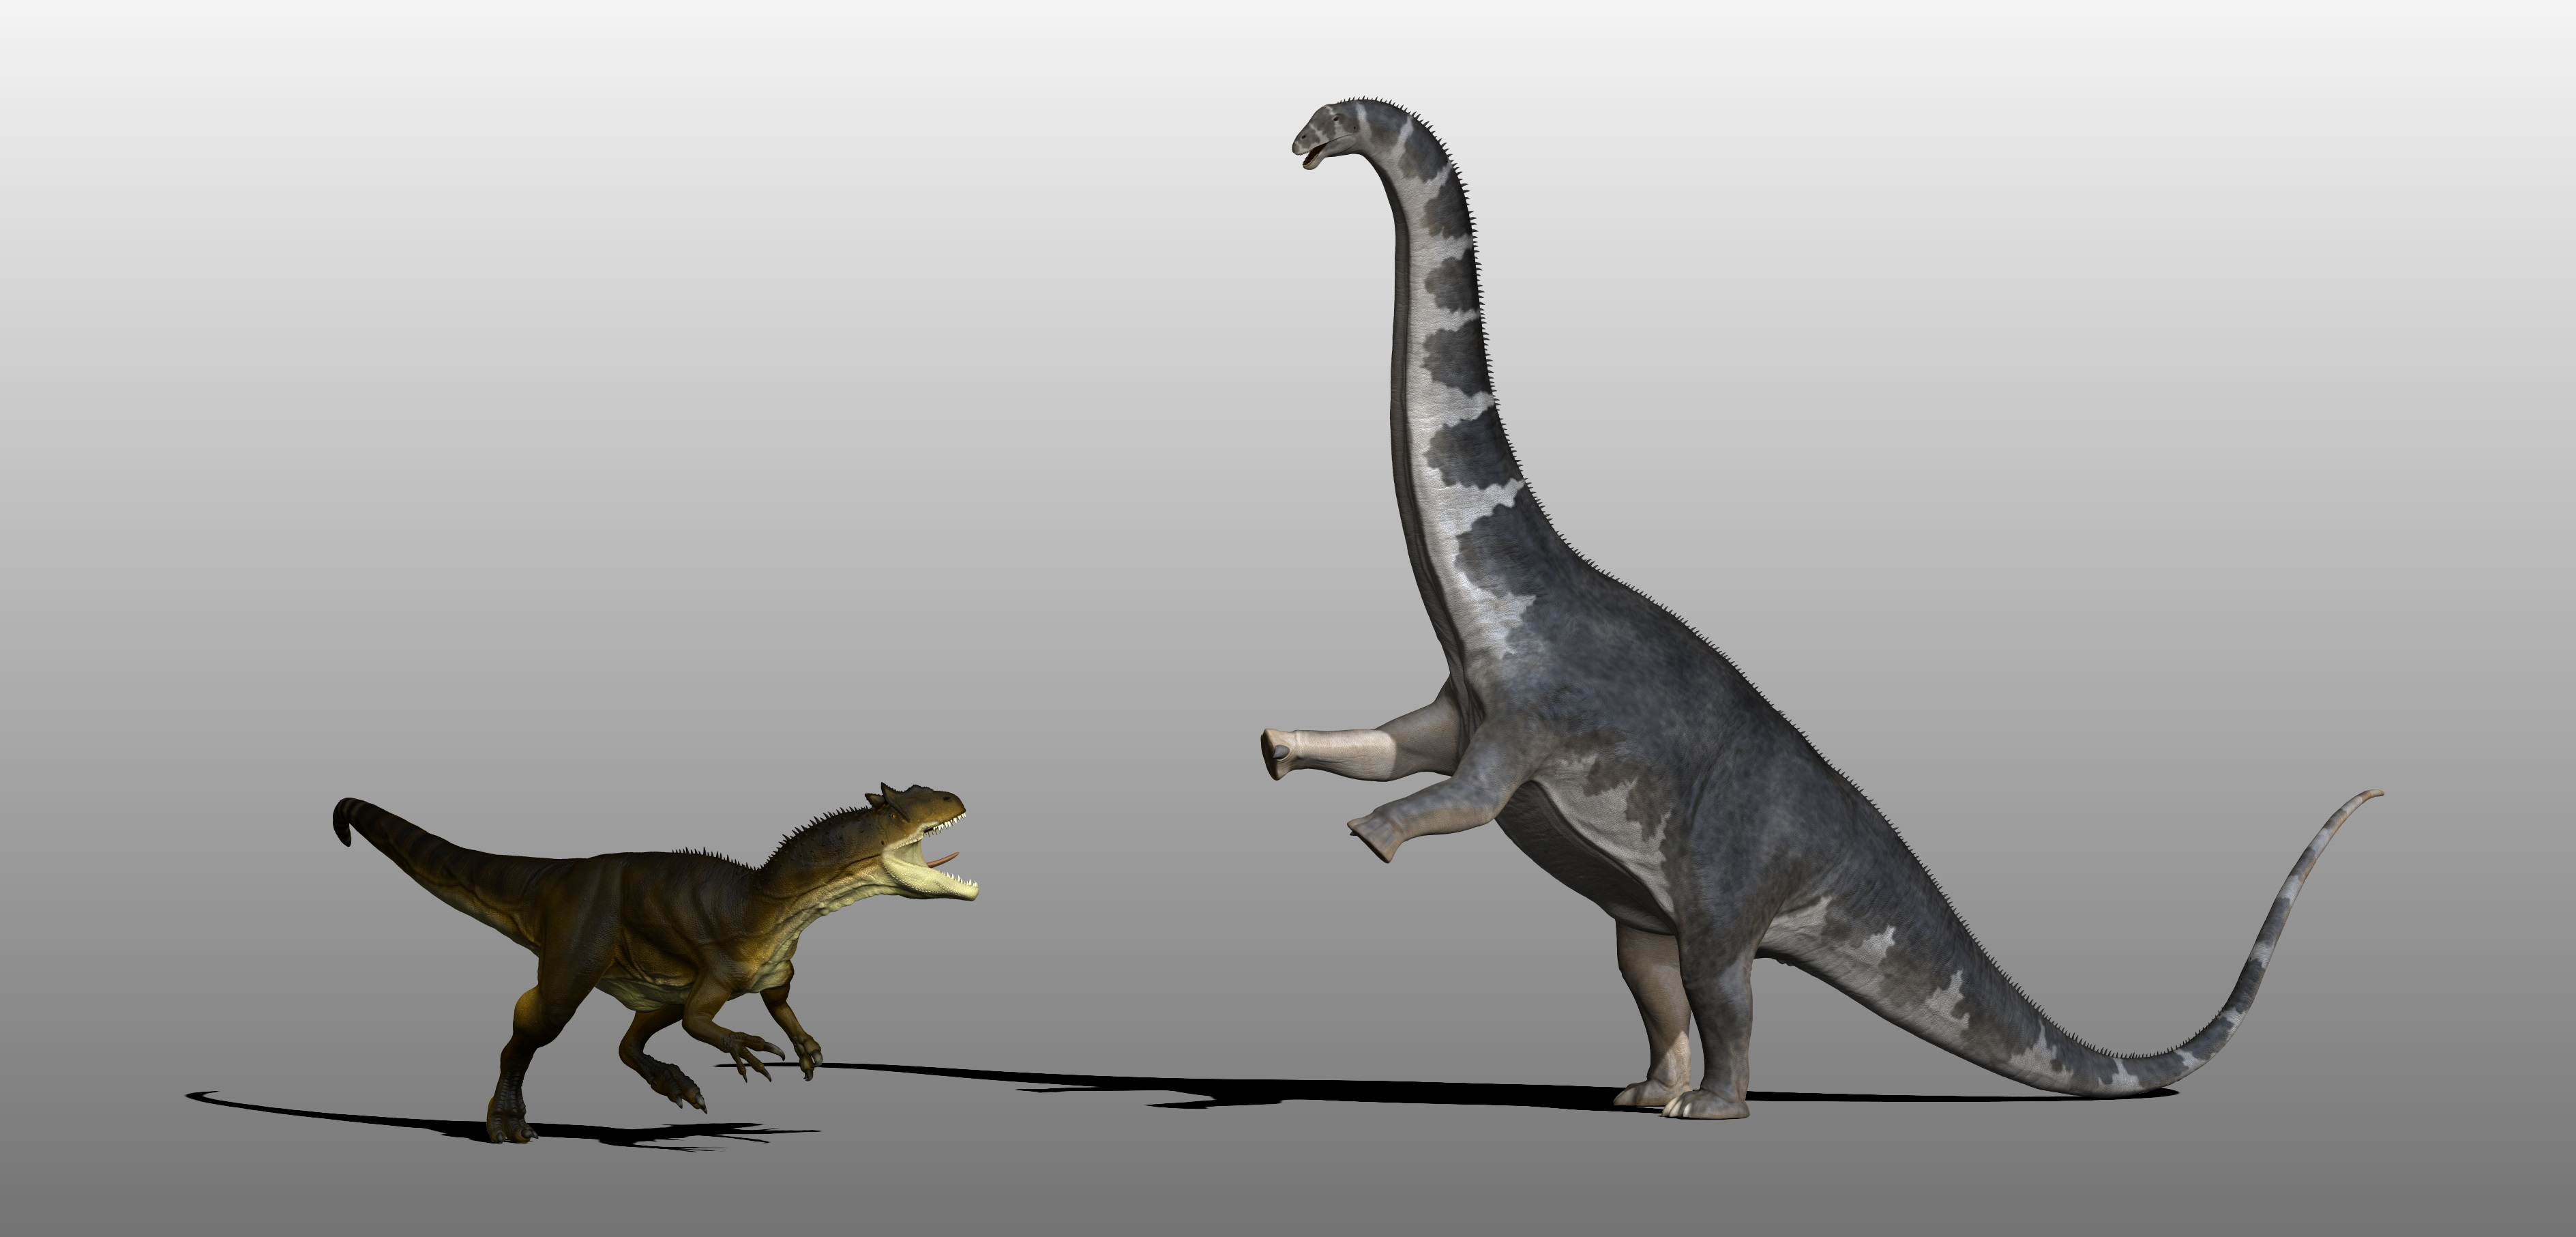 Allosaurus vs Apatosaurus by Manuelsaurus on DeviantArt